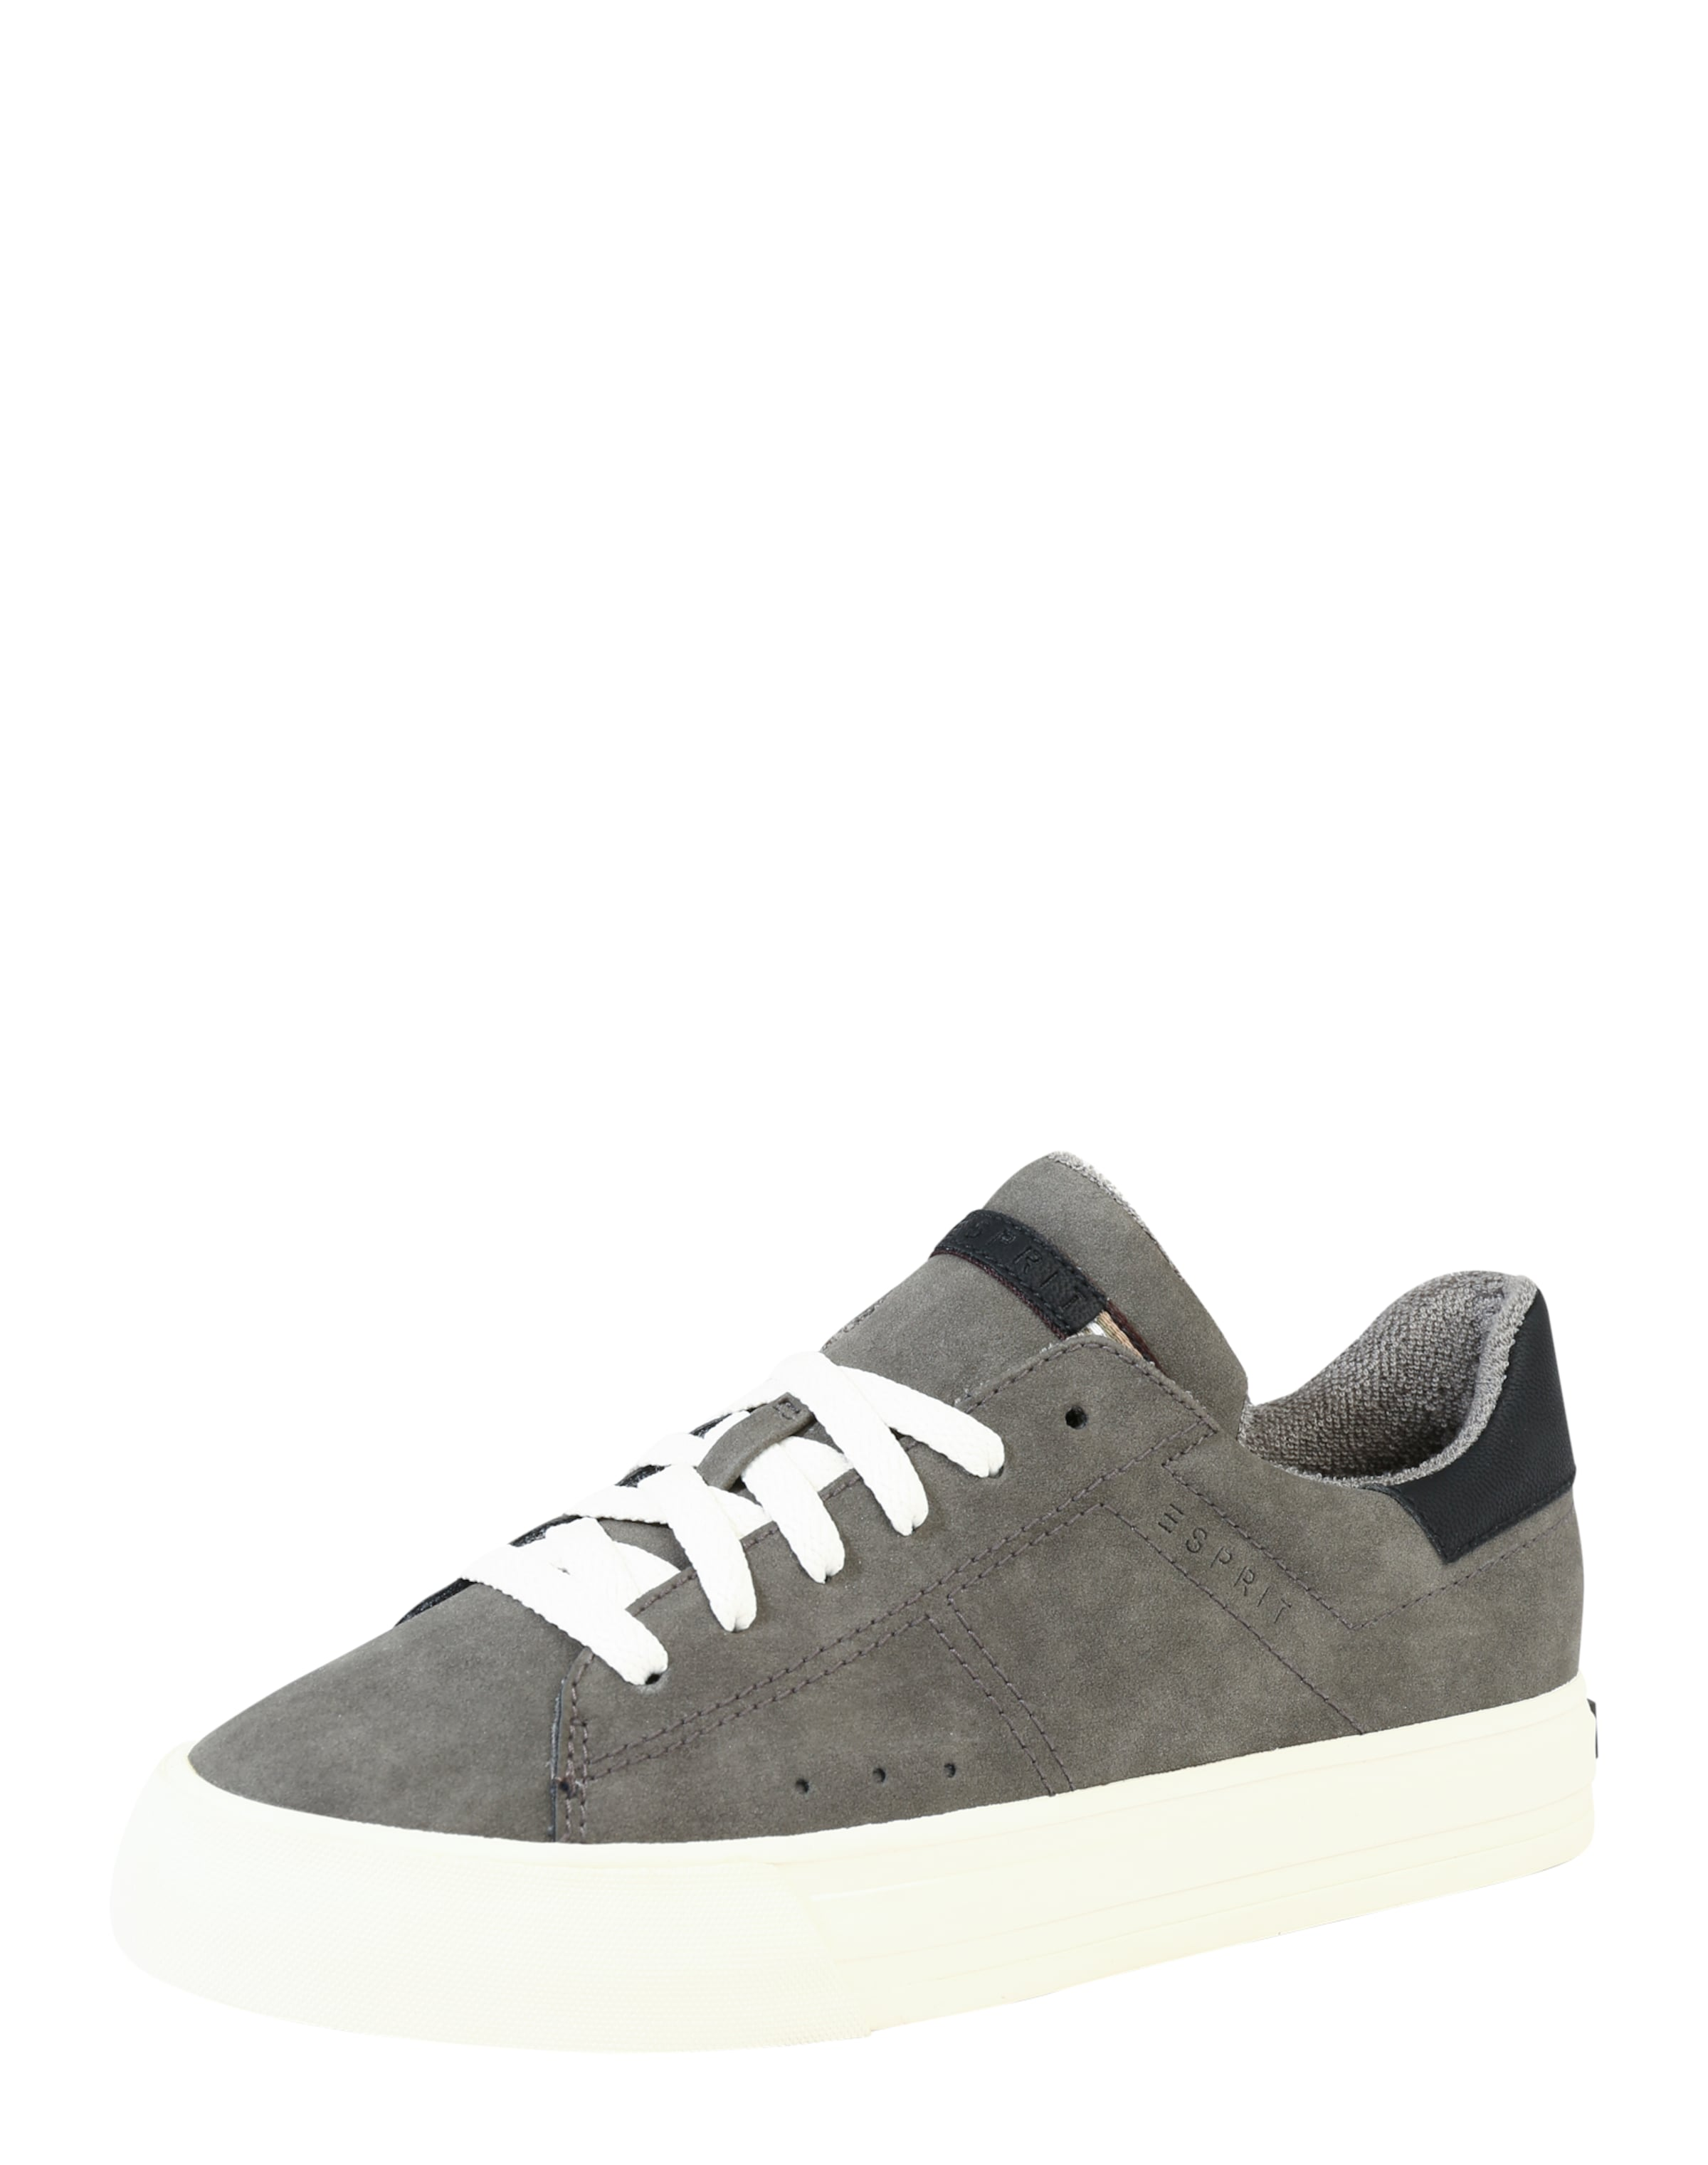 ESPRIT Sneaker Verschleißfeste Simona Verschleißfeste Sneaker billige Schuhe 383458